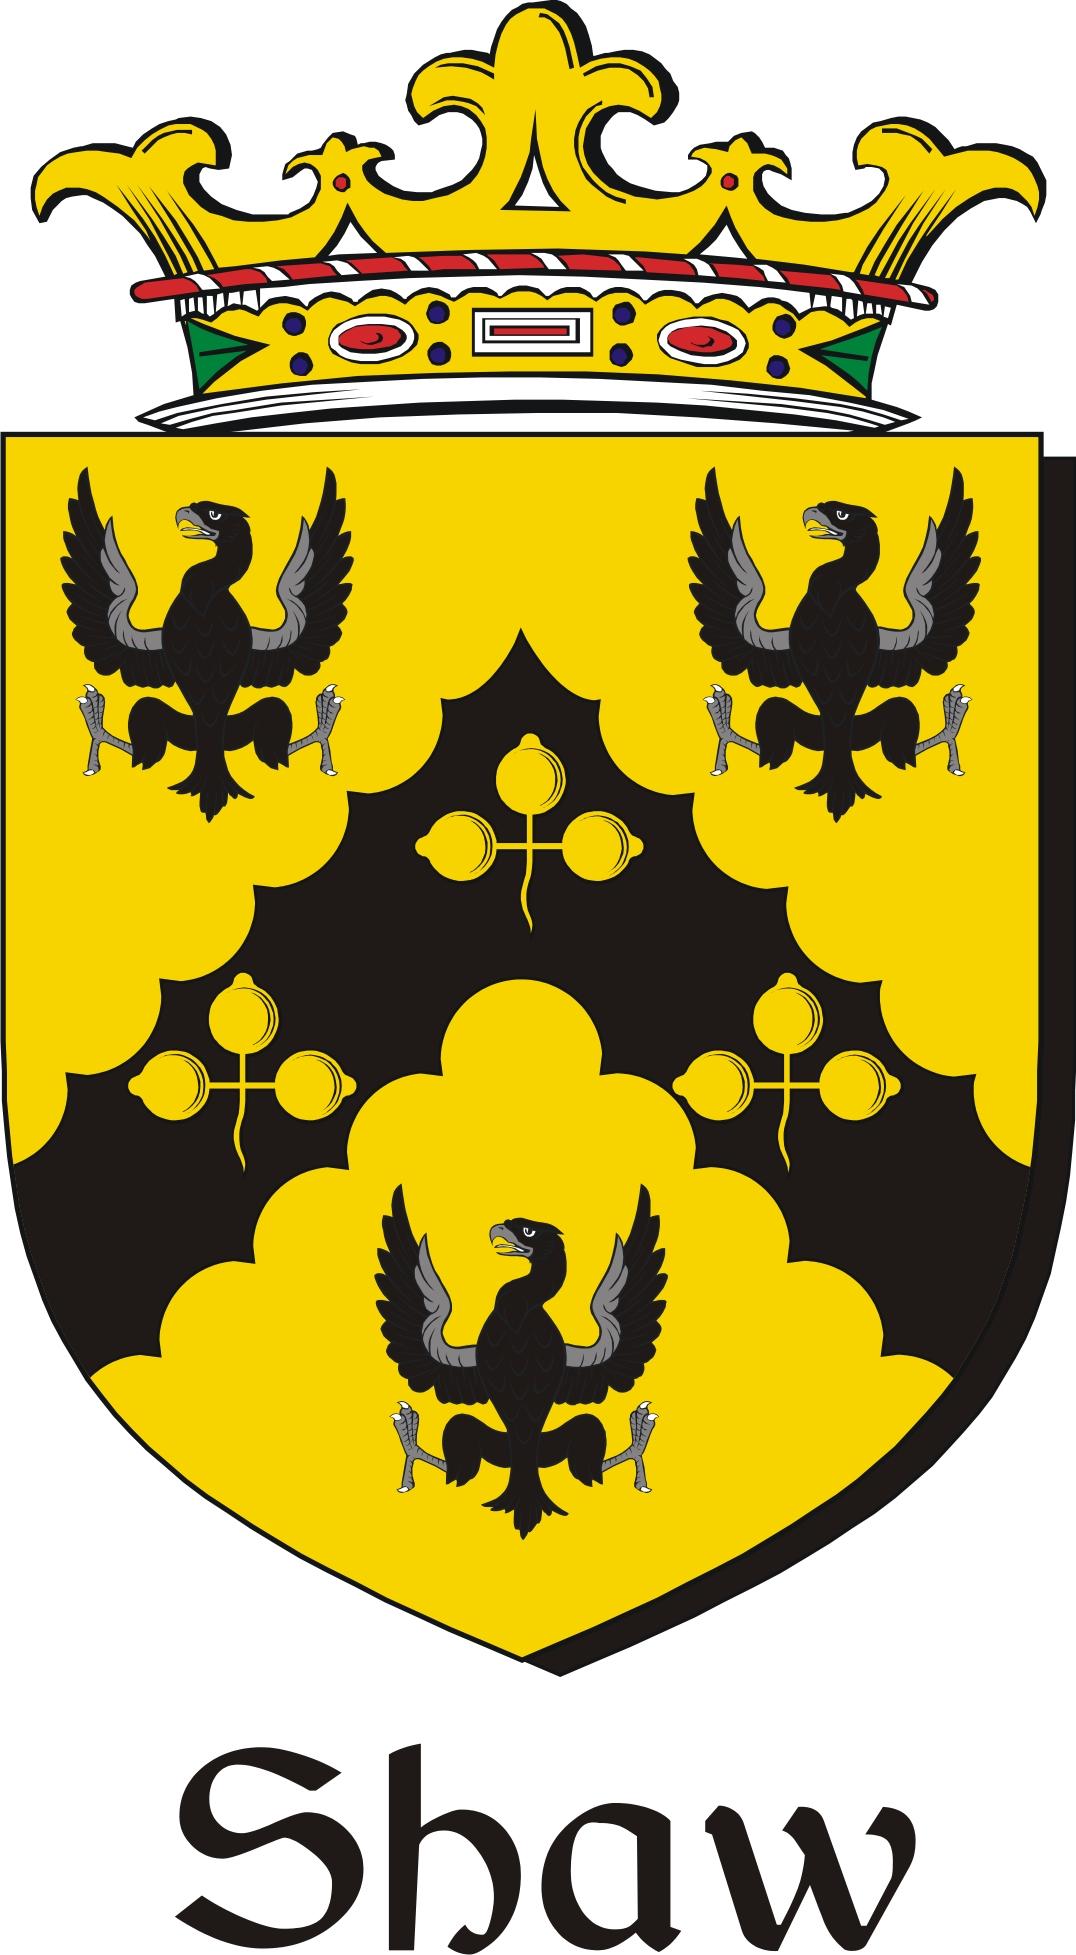 Shaw family crest irish coat of arms image download download fa shaw family crest irish coat of arms image download download fa biocorpaavc